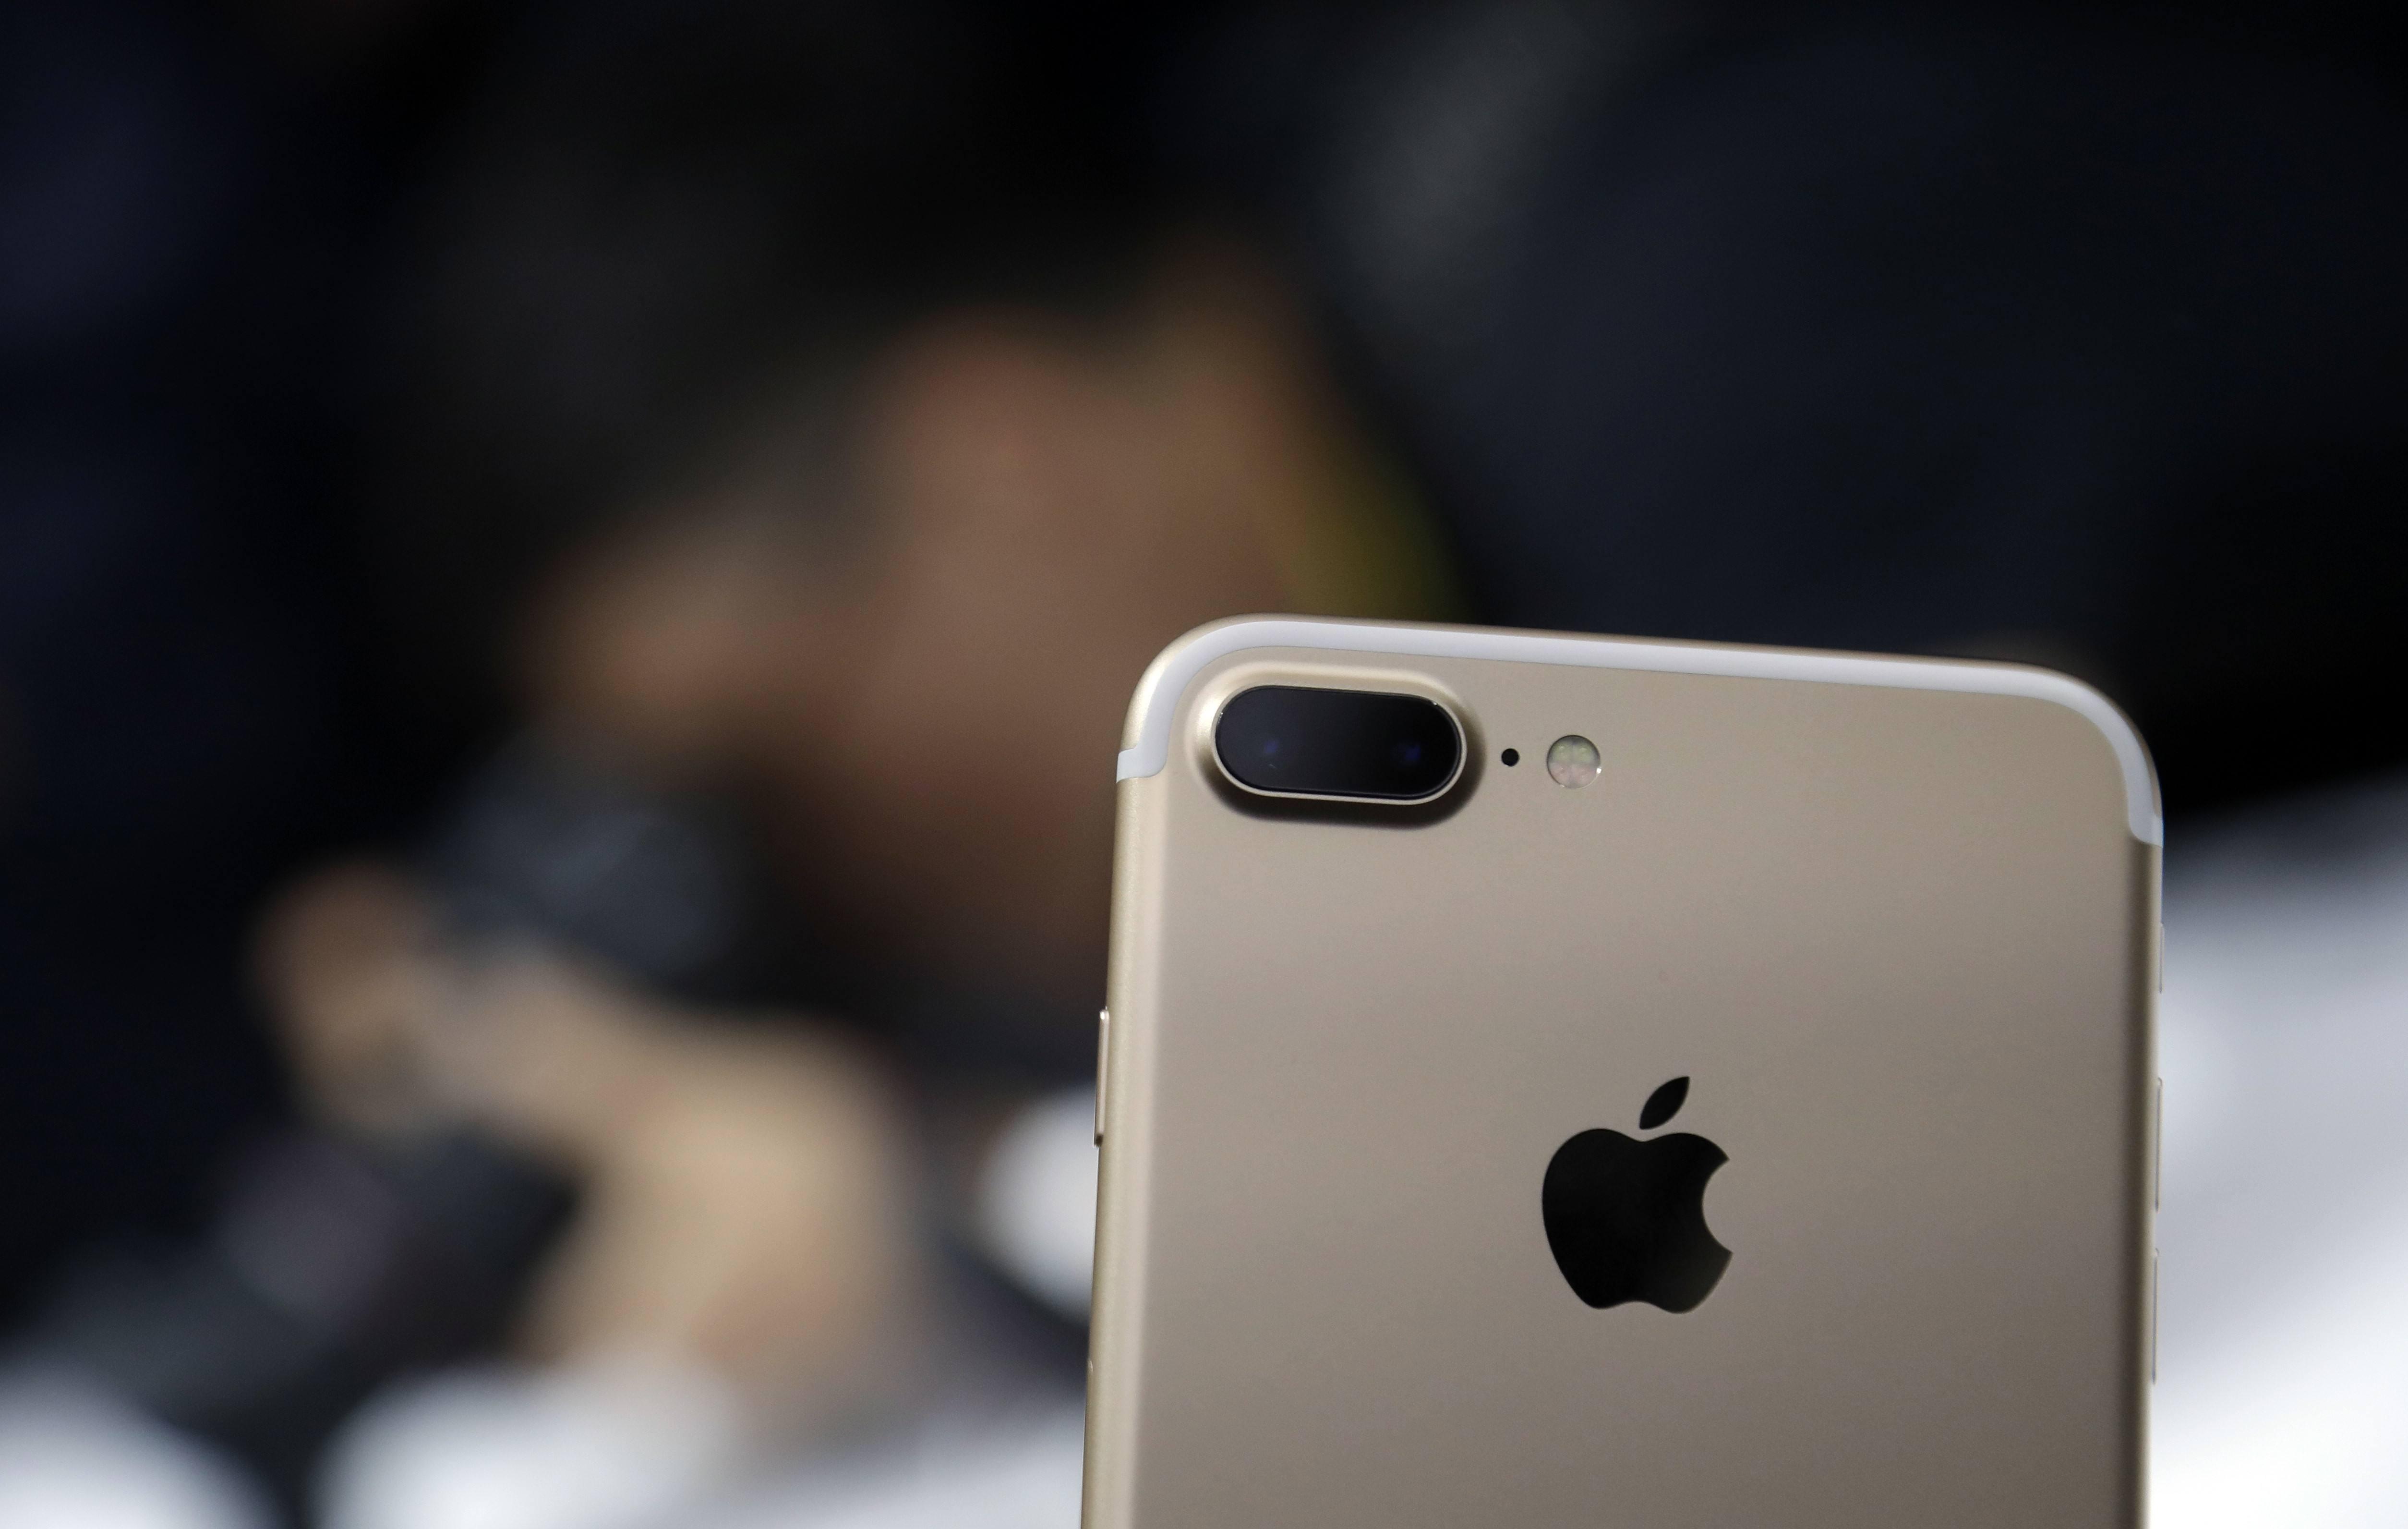 iPhone 新产品购买数量低于预期 将采用新方法推广